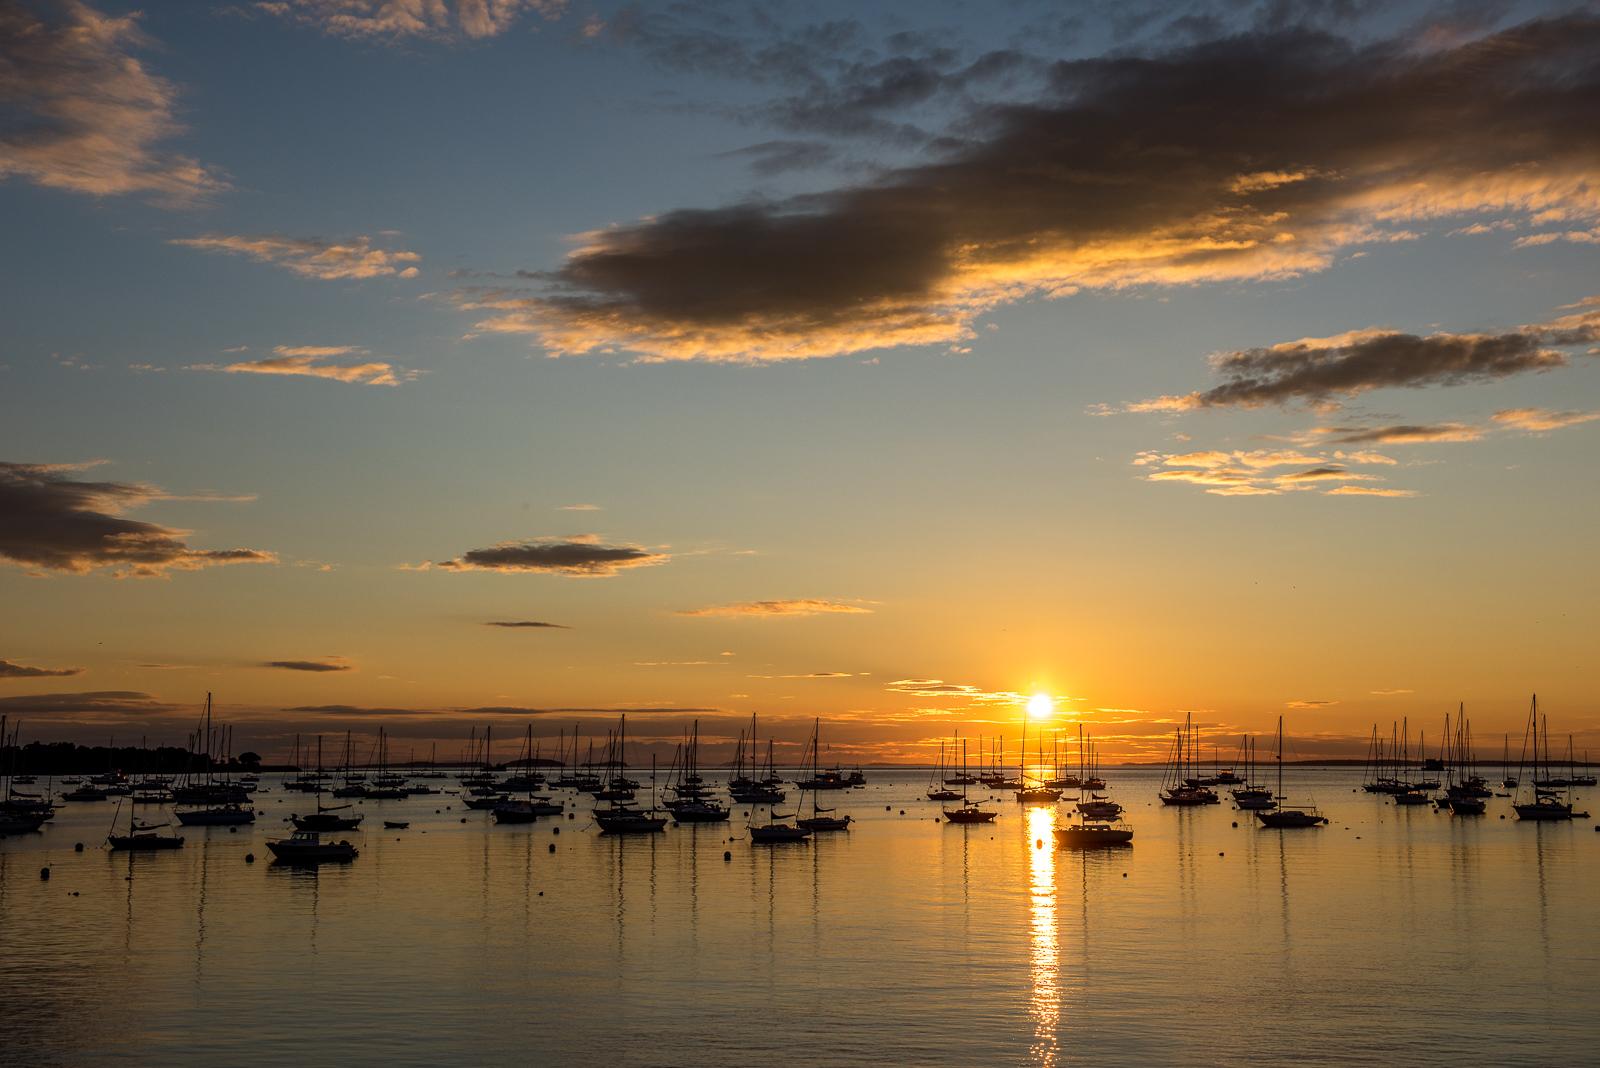 Sunrise, Rockland, ME, new england, coast, scenic, photo